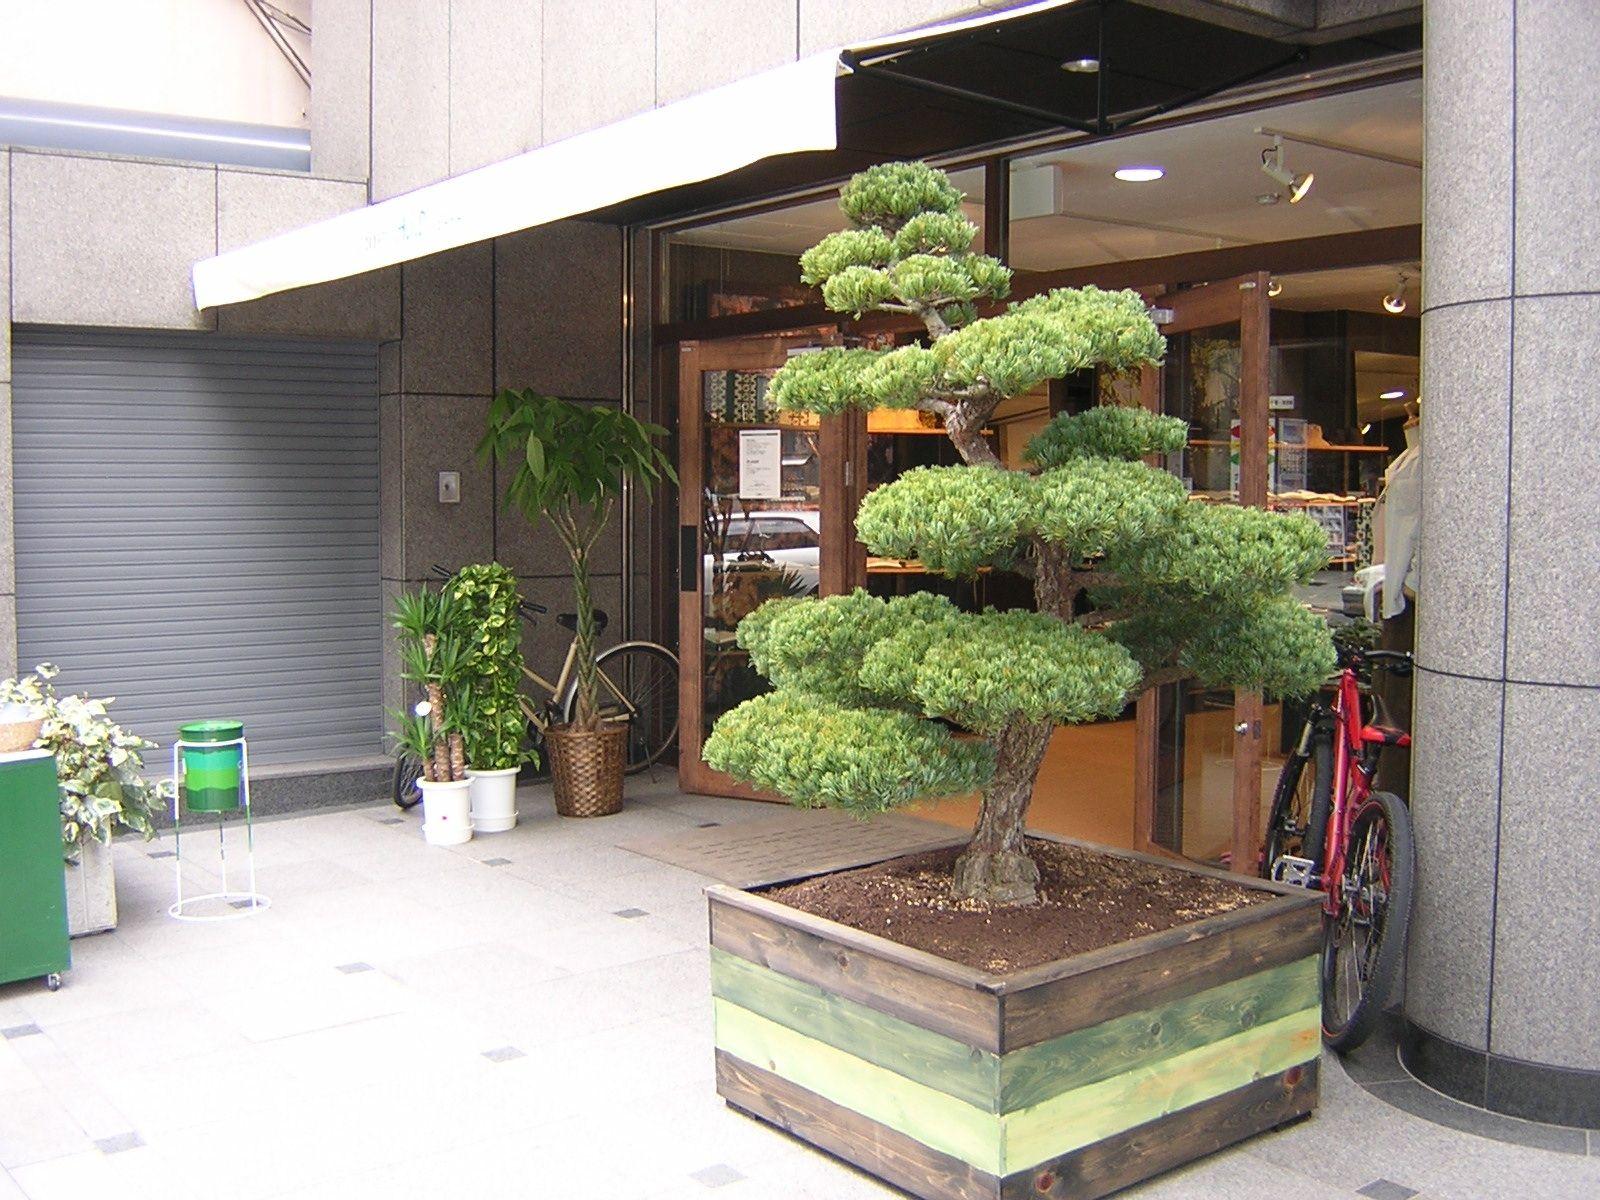 Pine trees of Japan Flowerpot. Original production Standard Works .